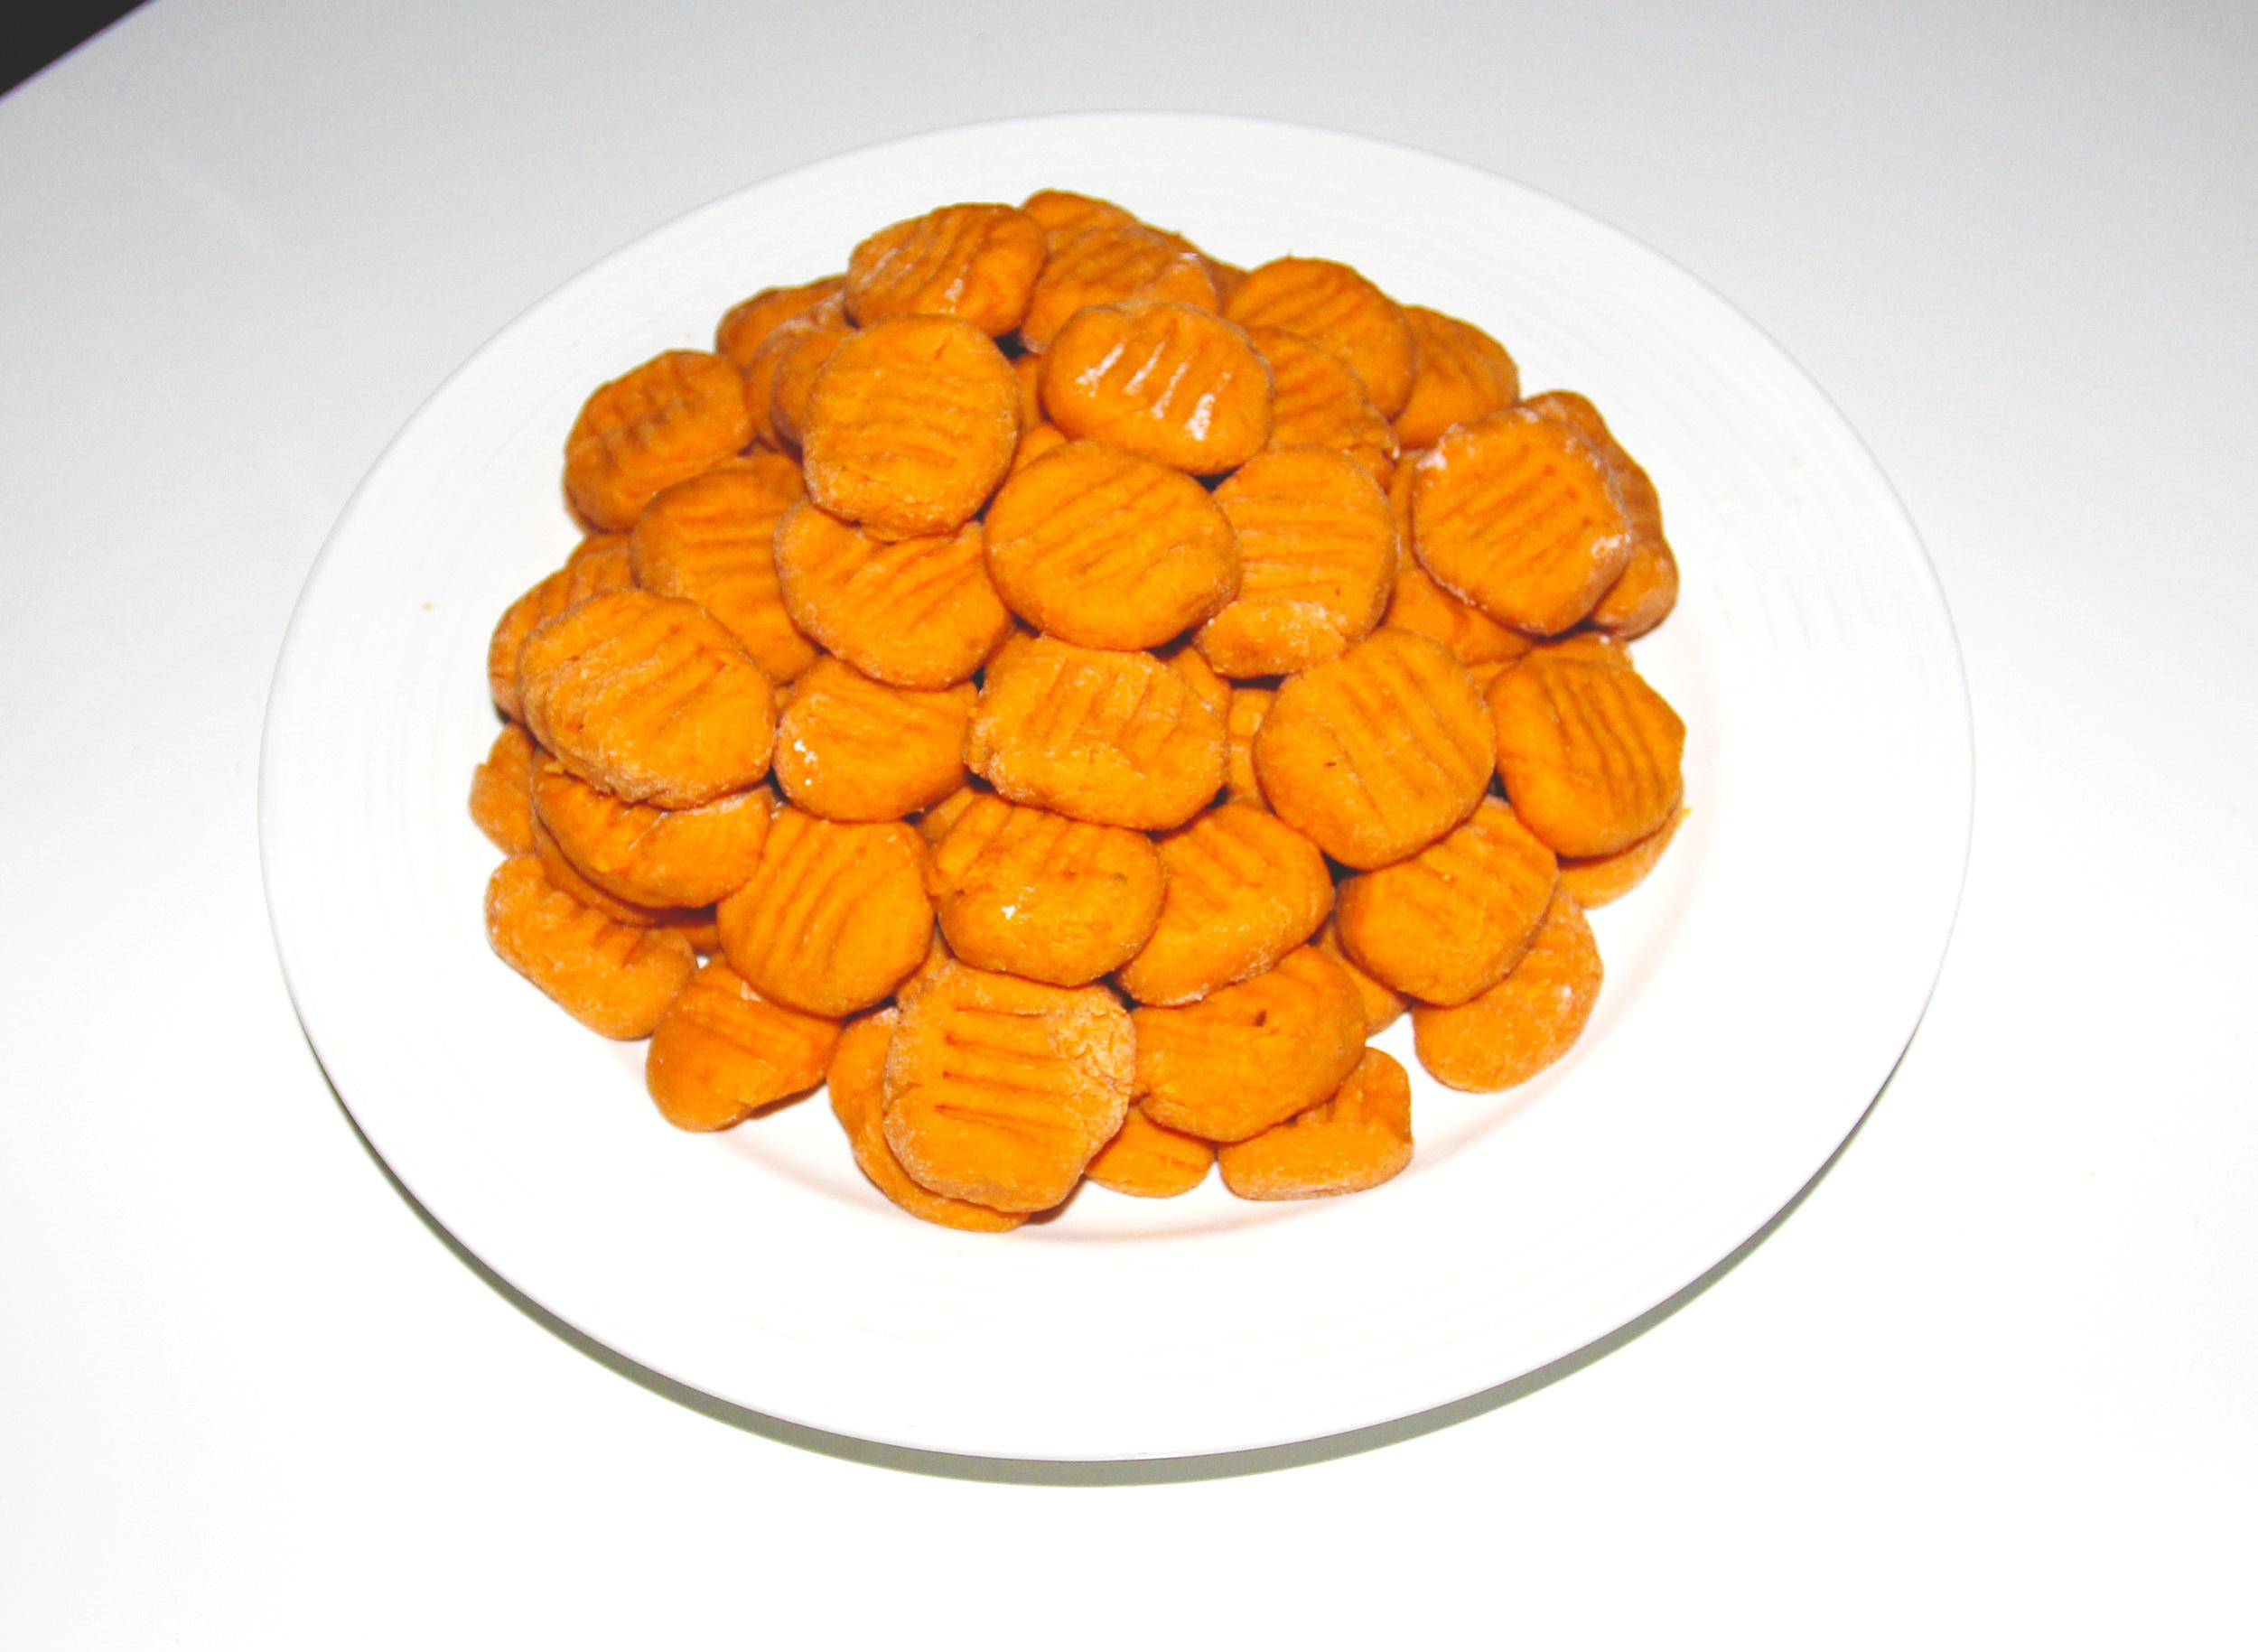 sweet-potato-gnocchi-edited-2.jpg